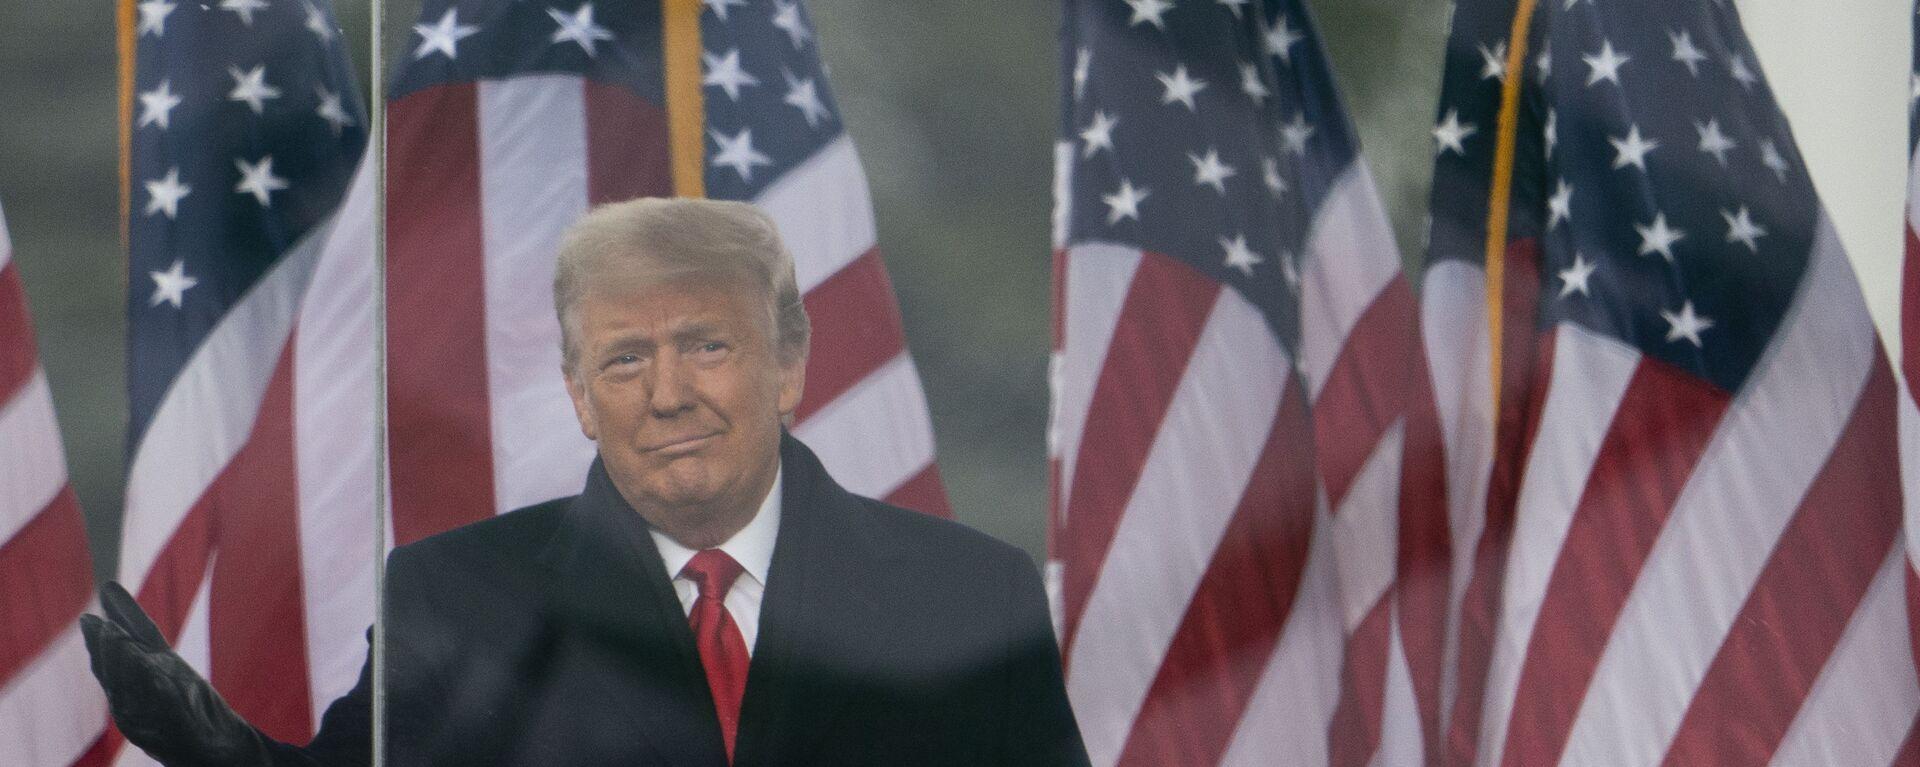 Il presidente Donald Trump - Sputnik Italia, 1920, 03.06.2021